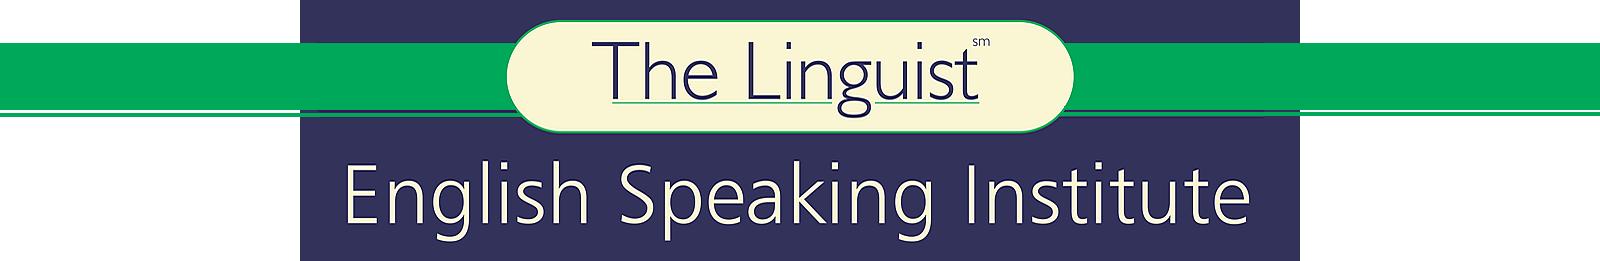 ;inguist - English Speaking institute